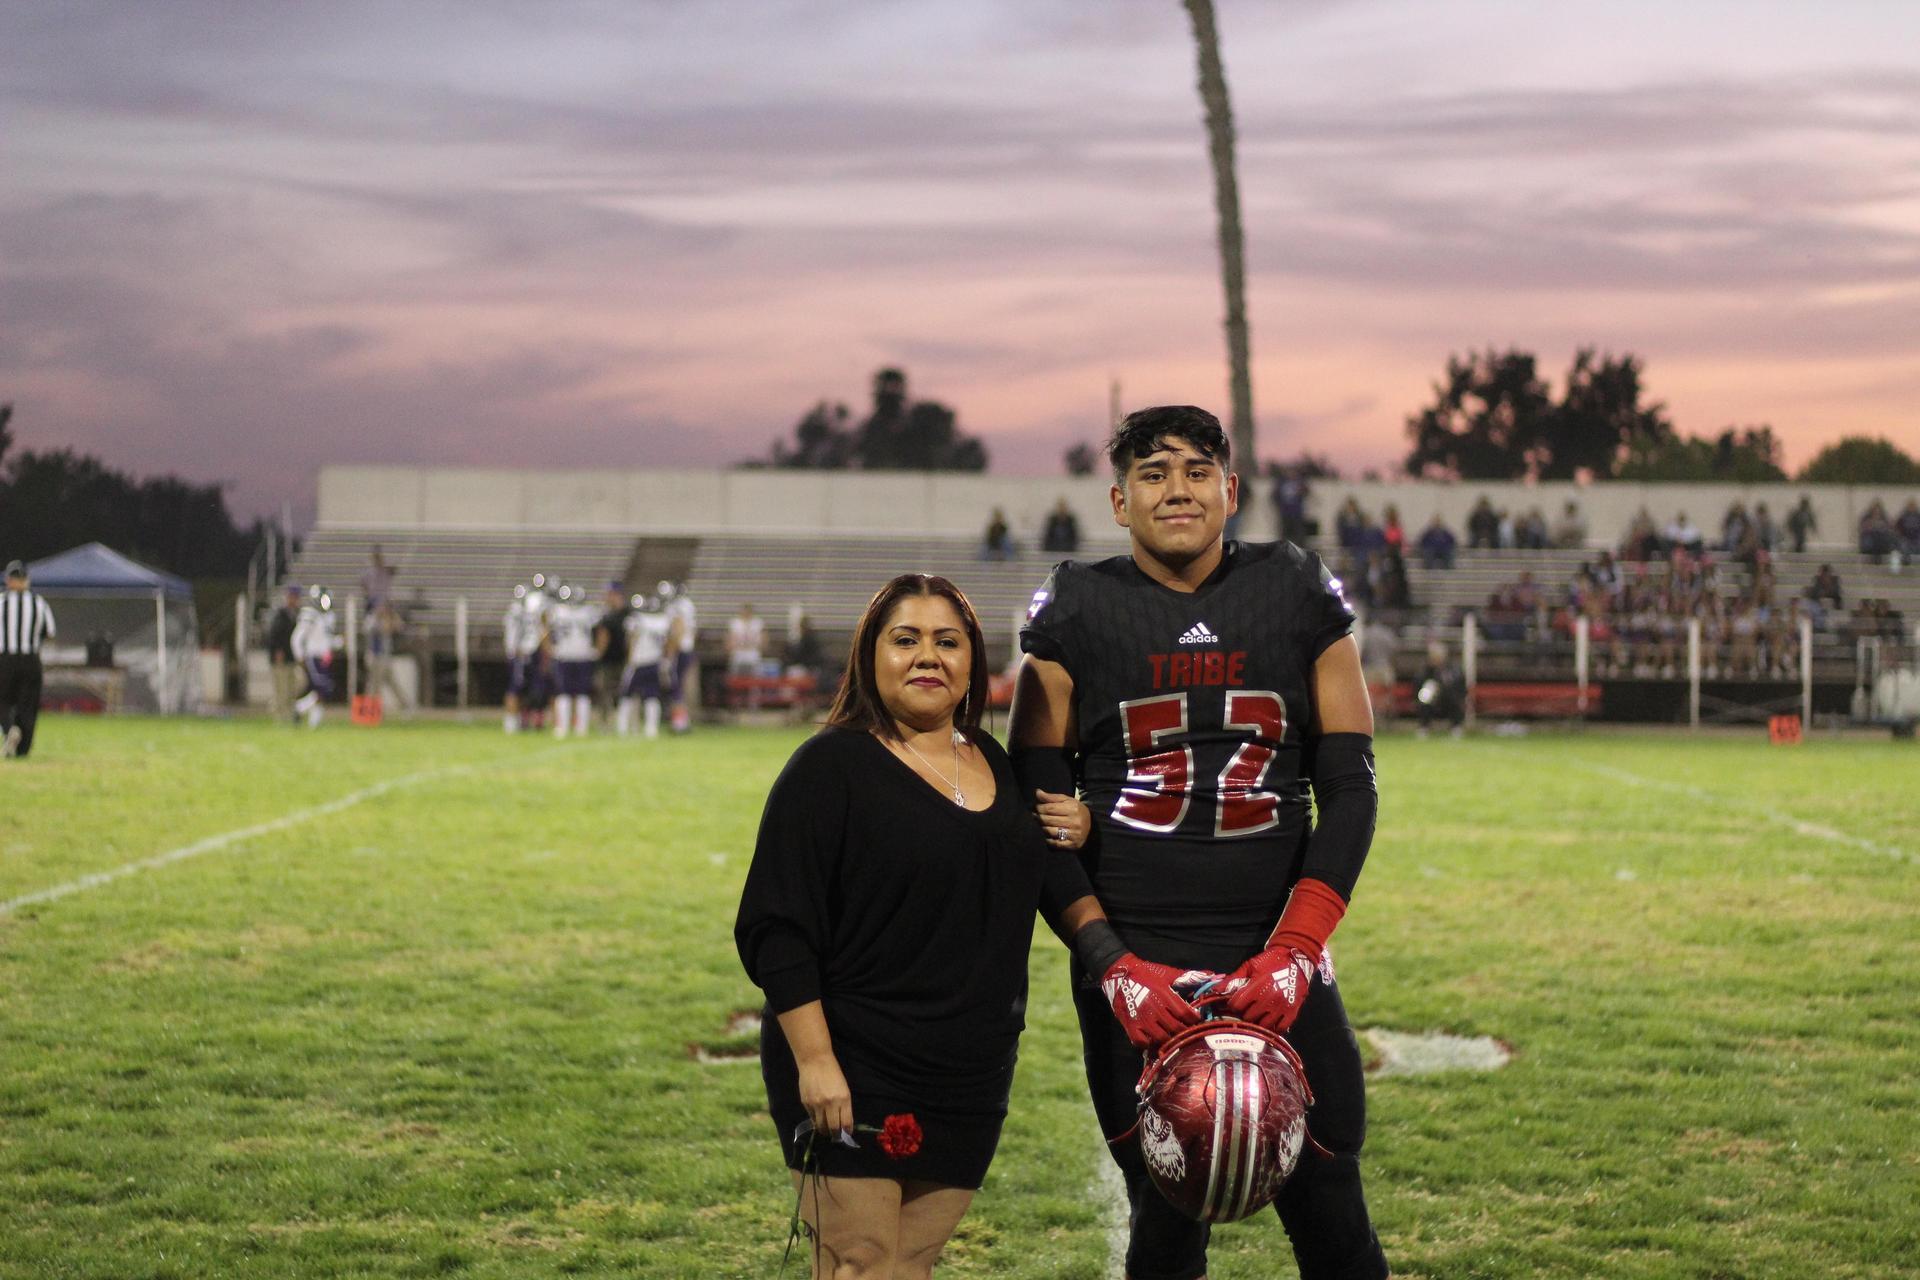 Senior football player Damian Rodriguez and his escort.